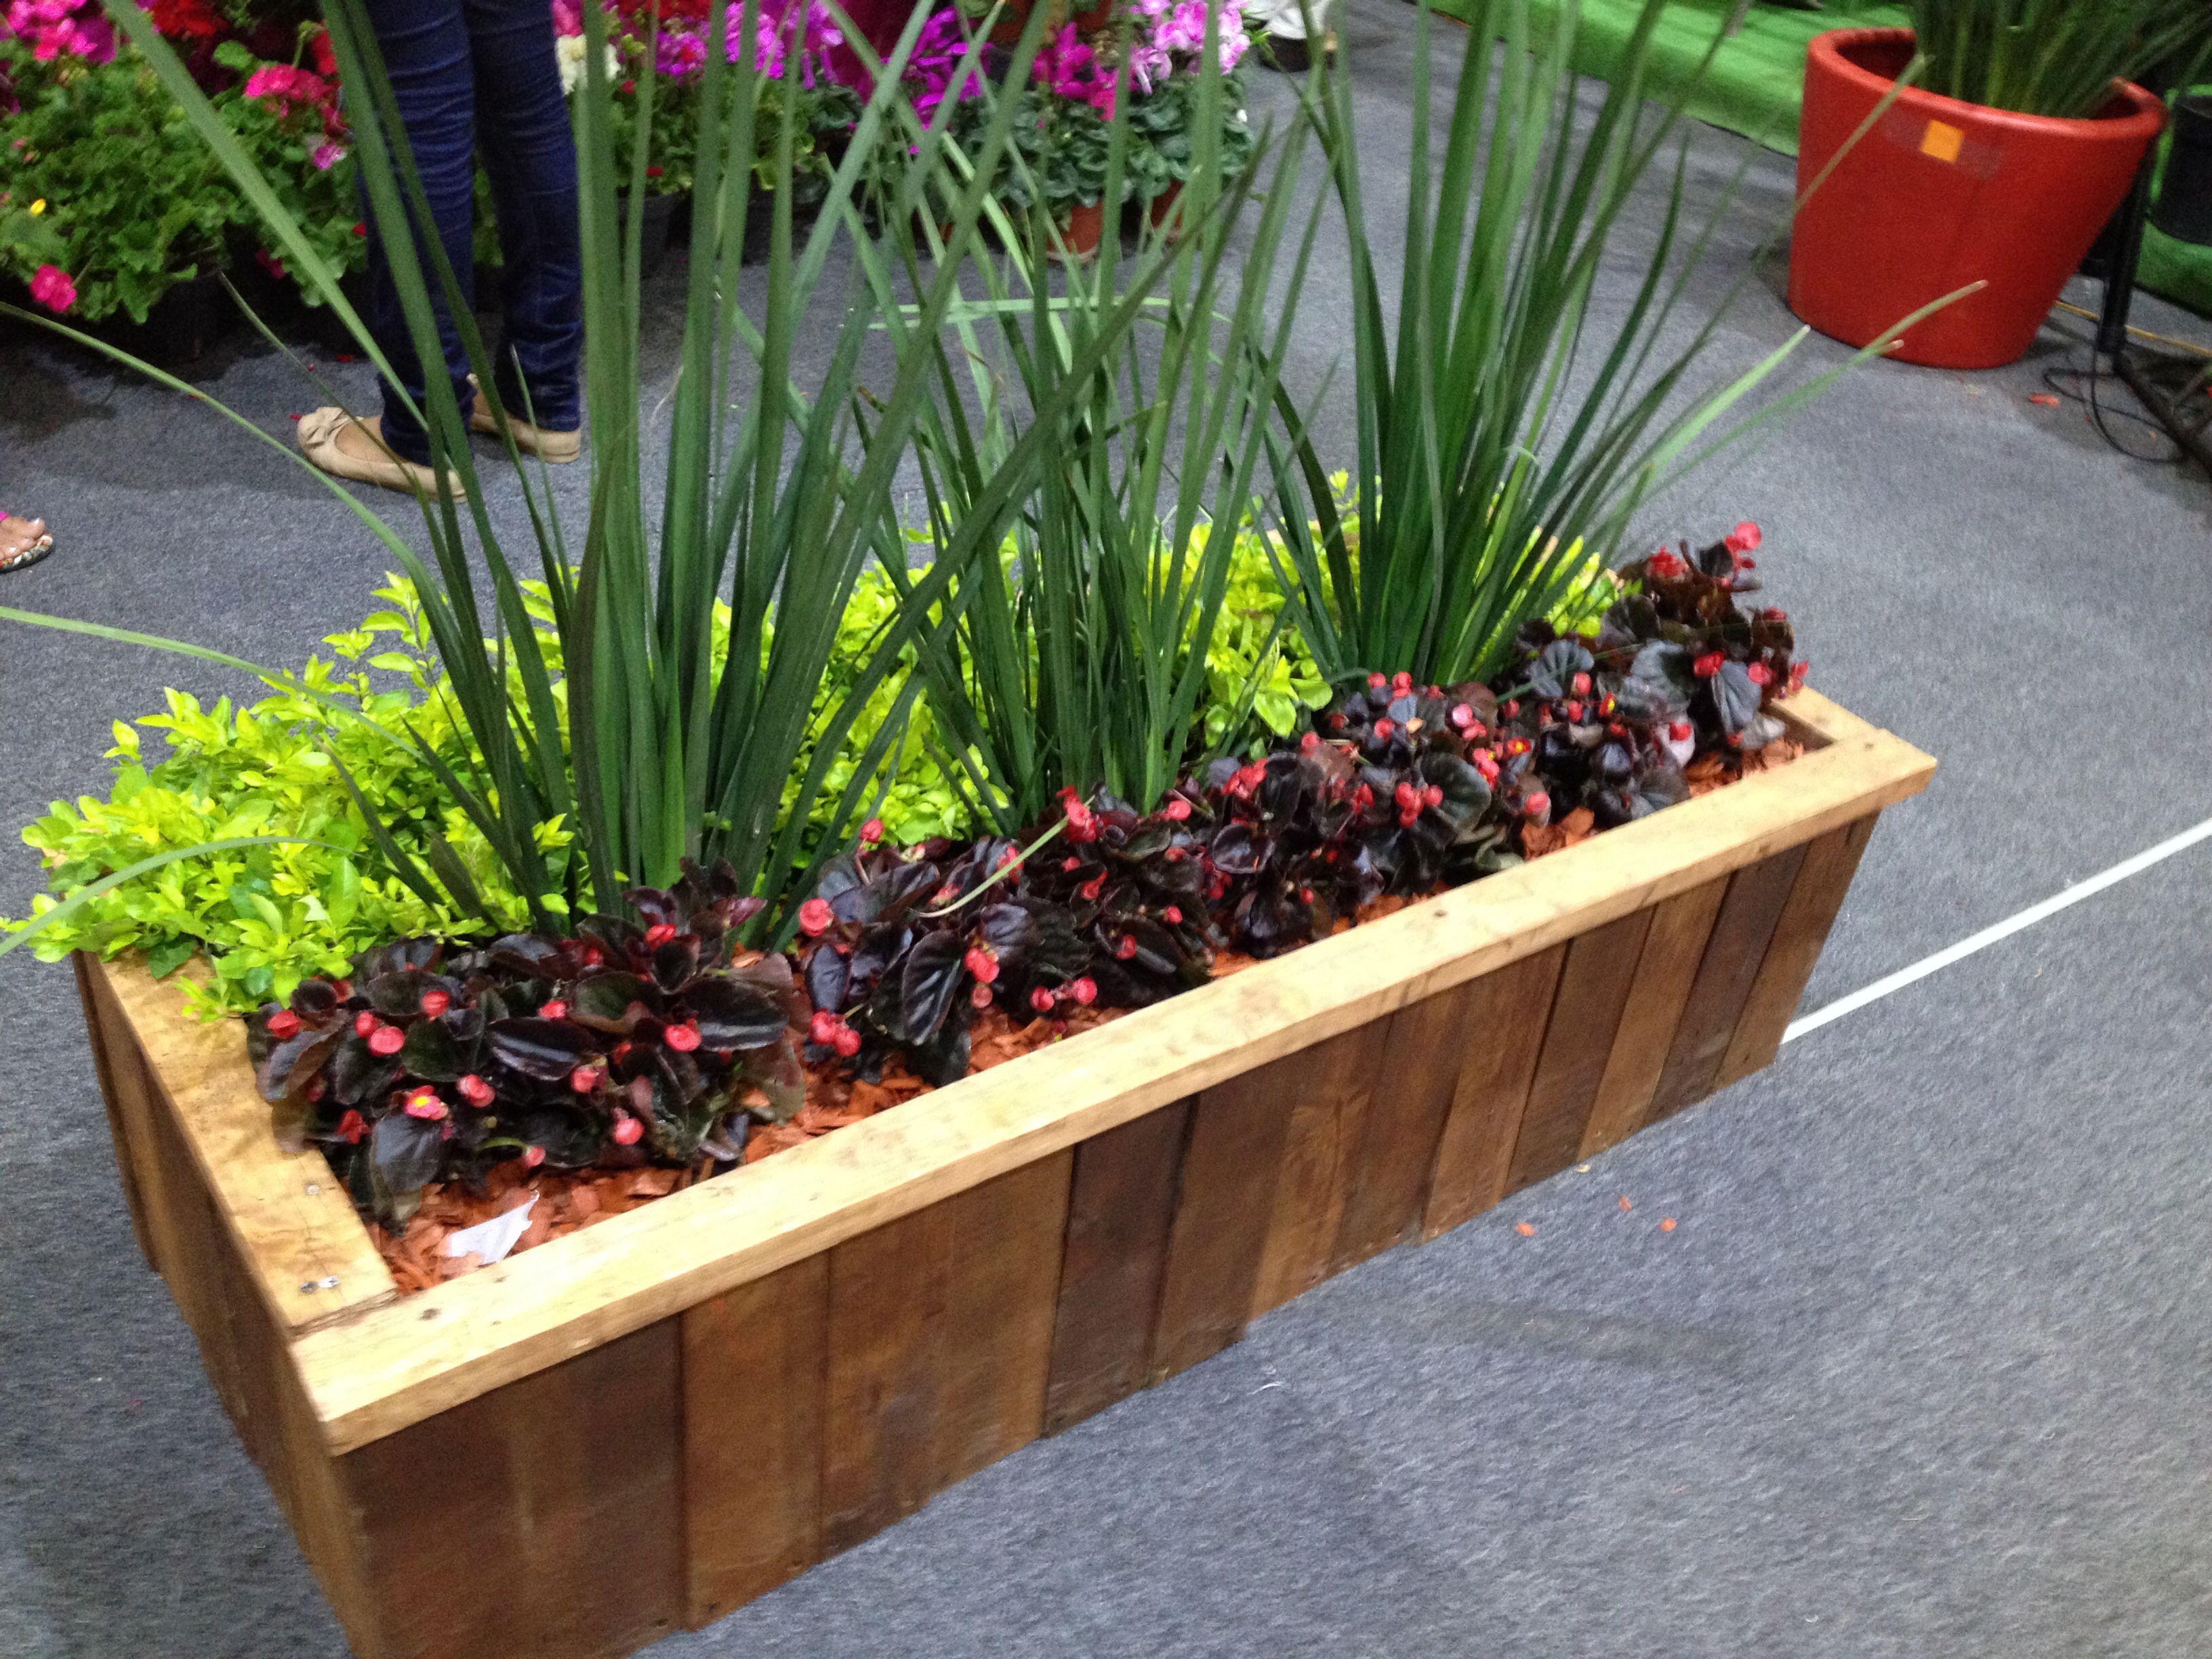 Macetero de madera reciclada vivero pinterest for Como iniciar un vivero en casa